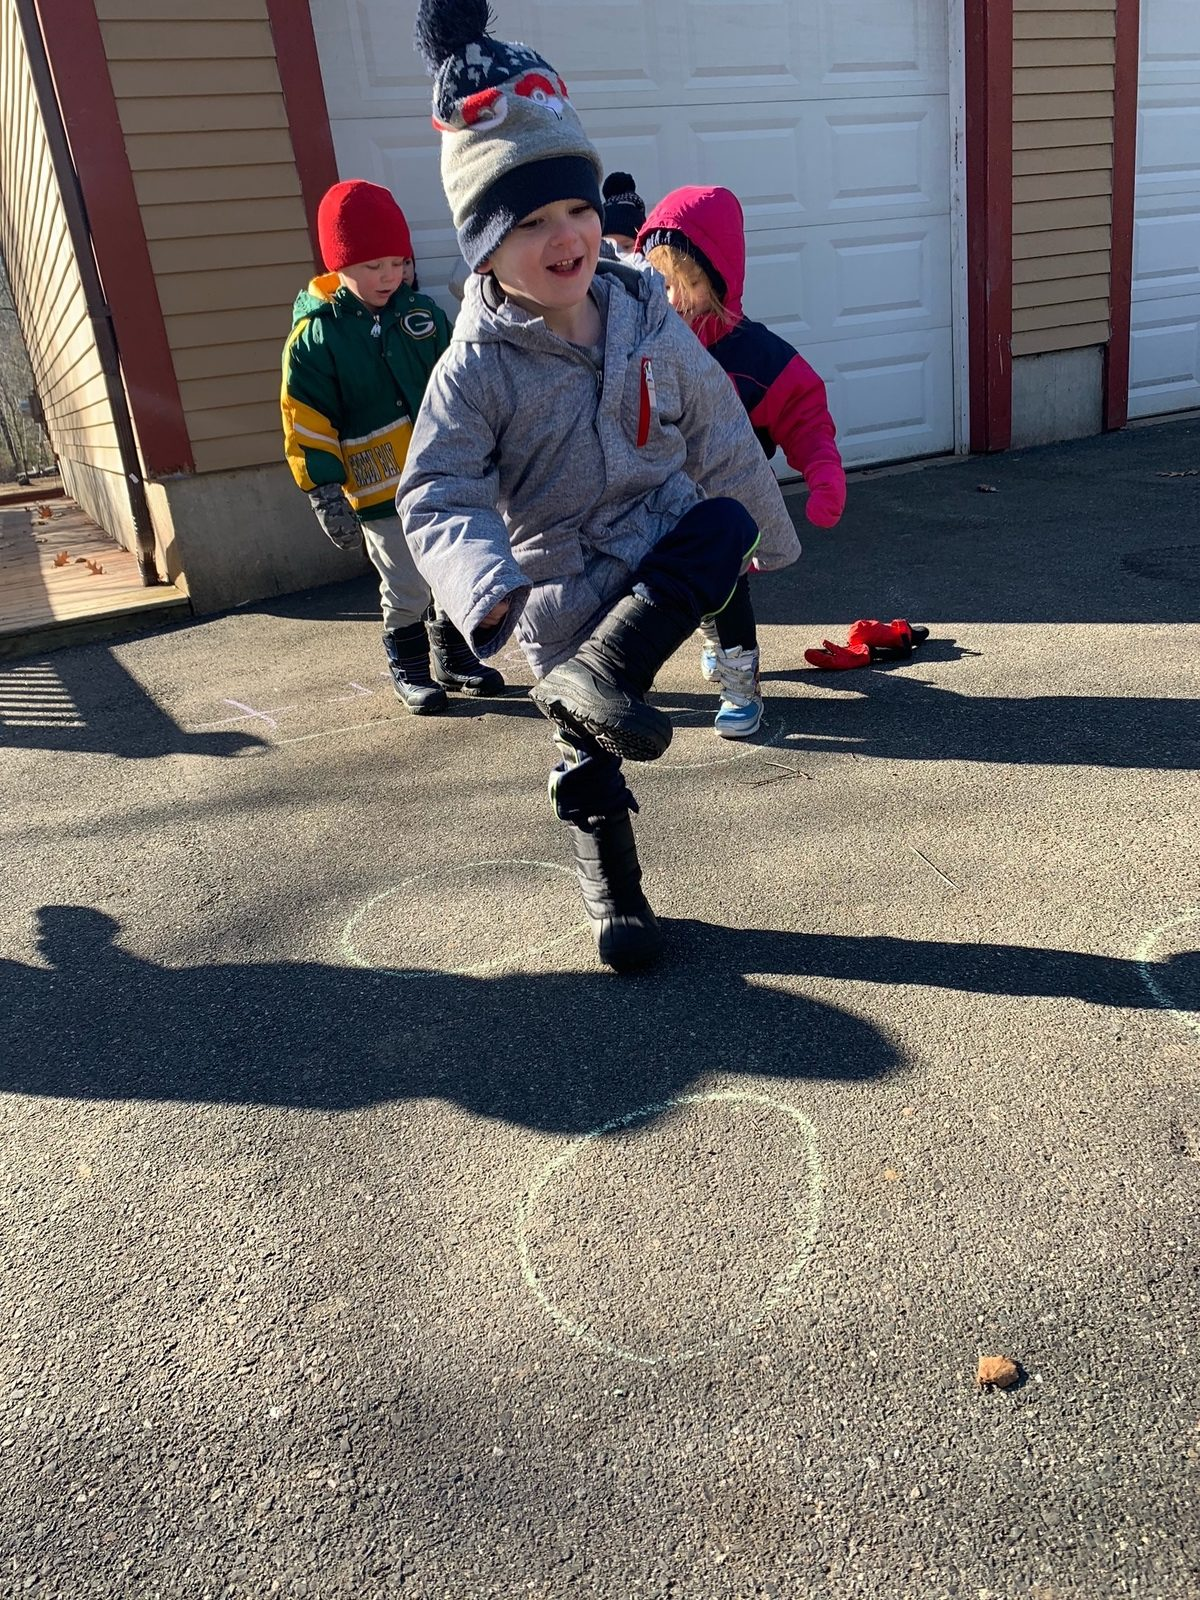 PreK Laugh Learn 2 Week 3 Winter Games 2021 Moment of the Week